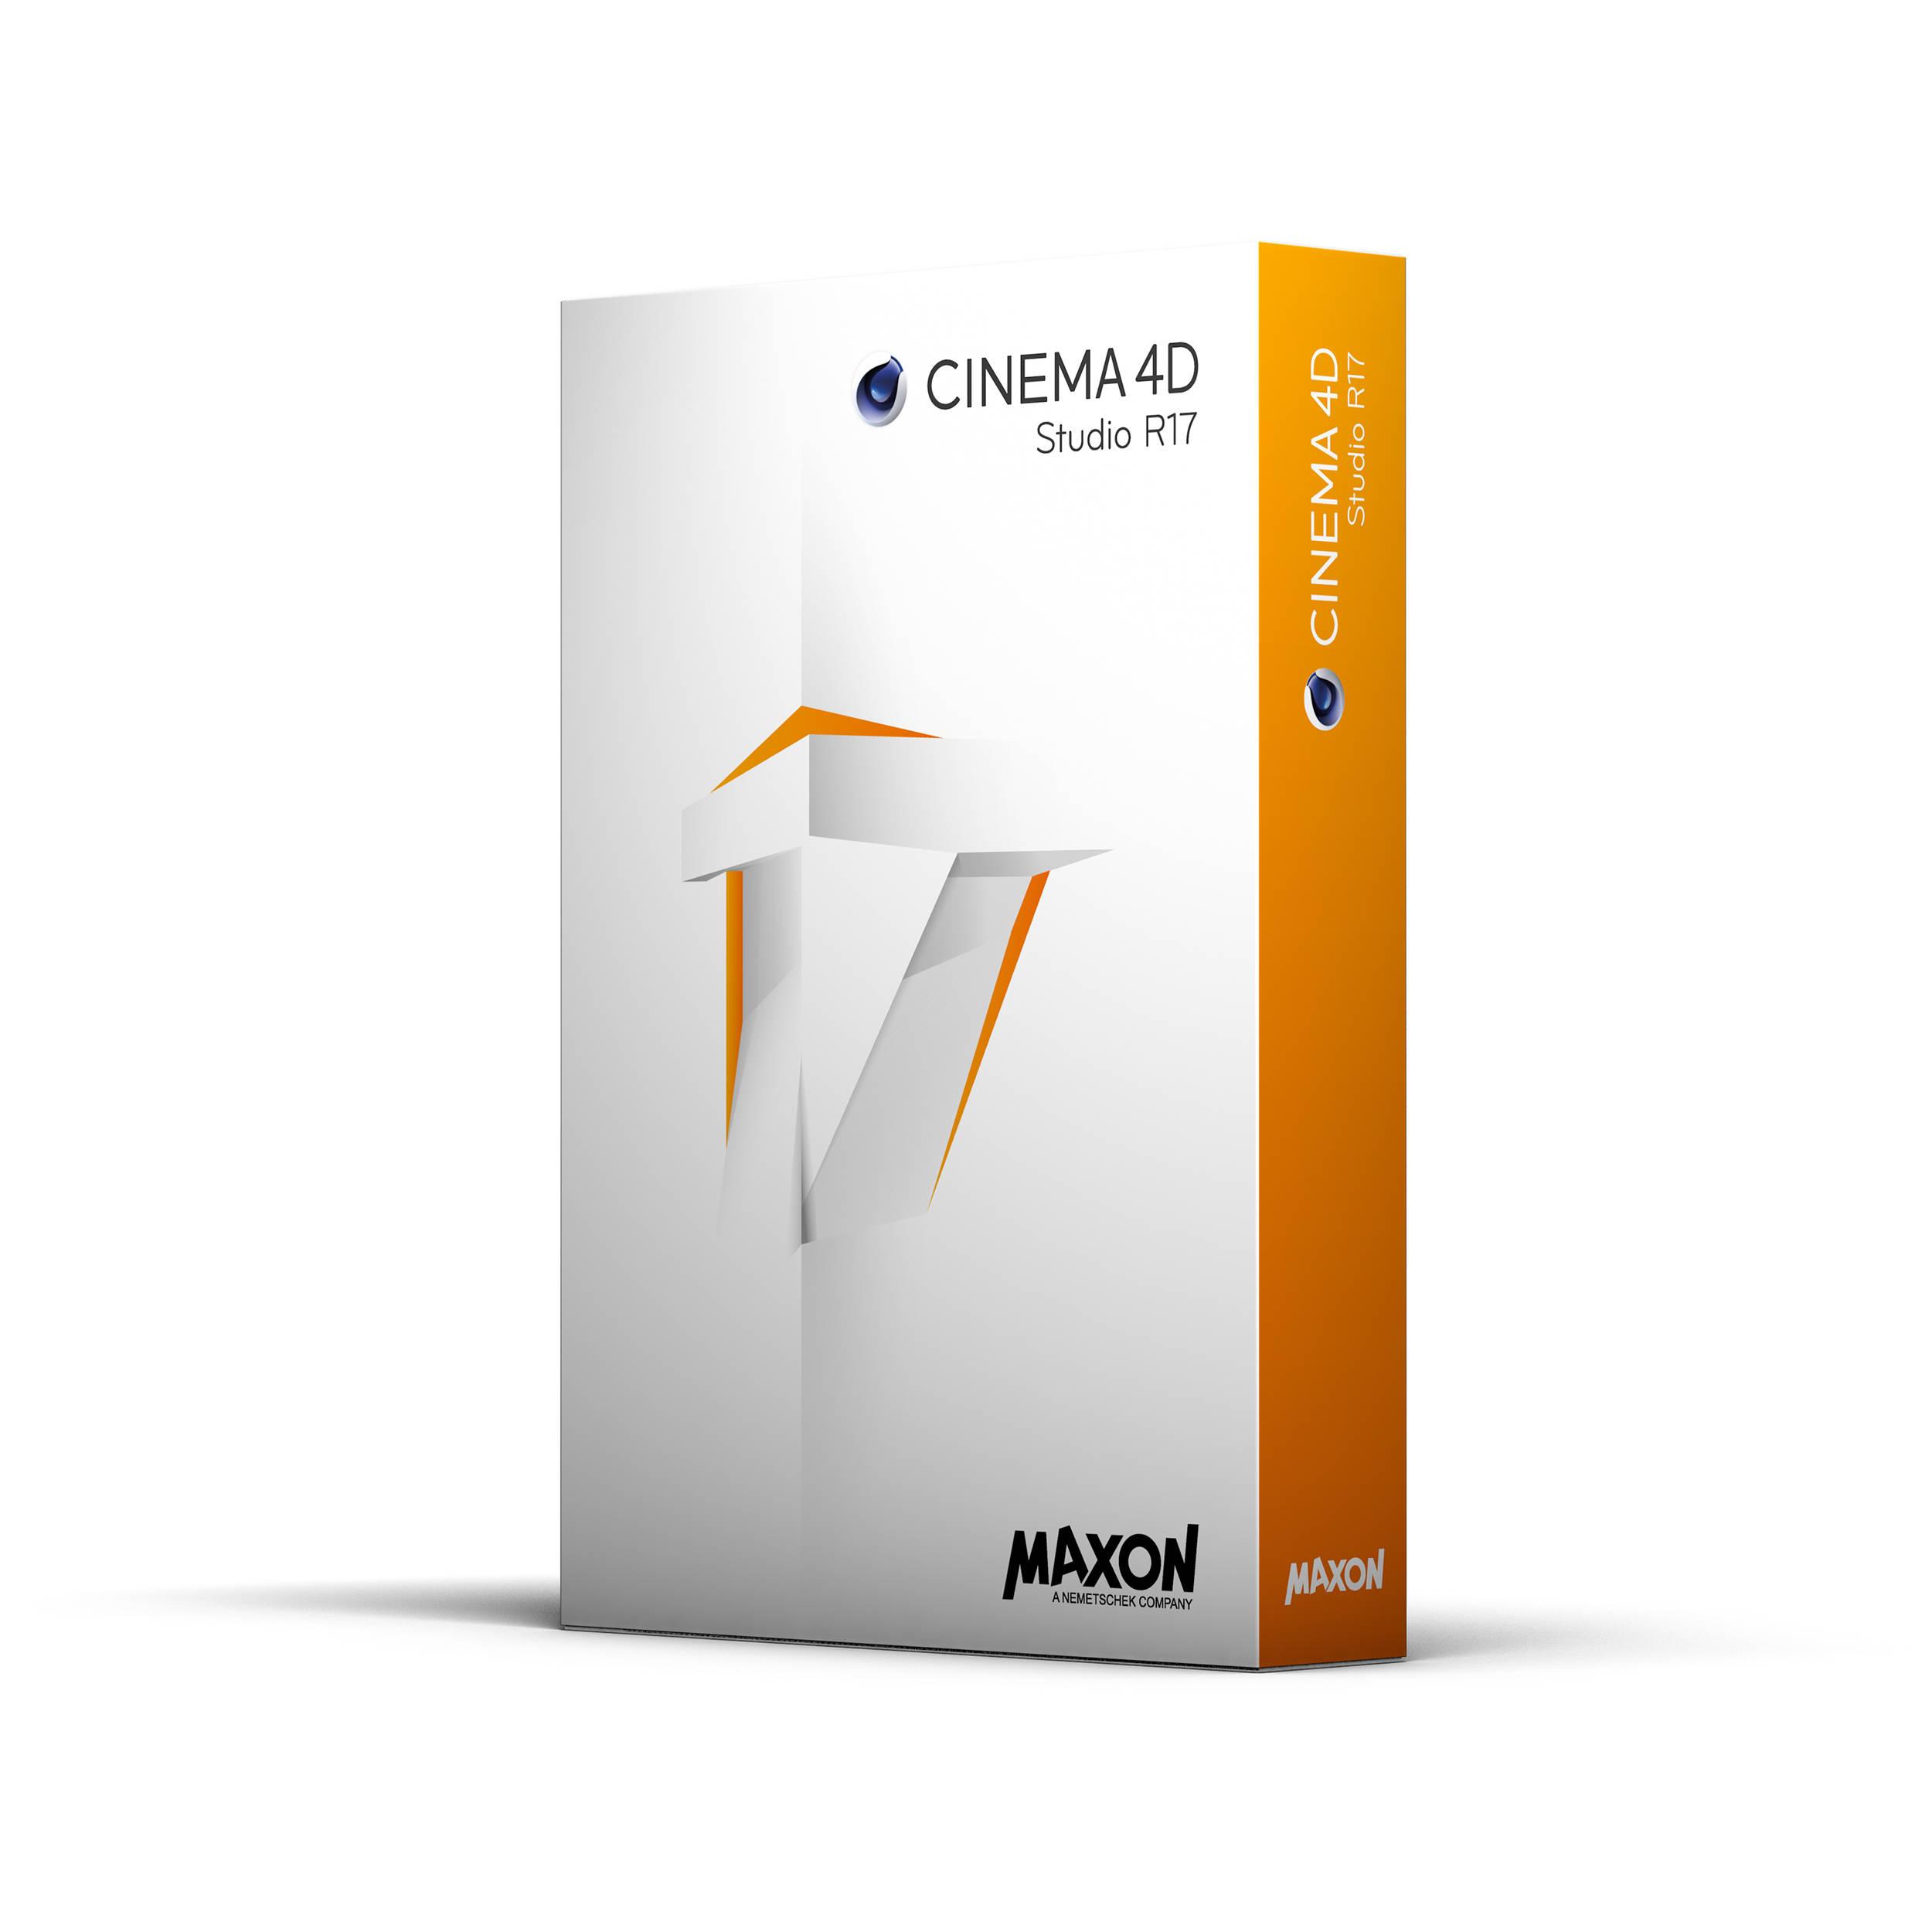 Buy Maxon Cinema 4D Studio R17 mac os